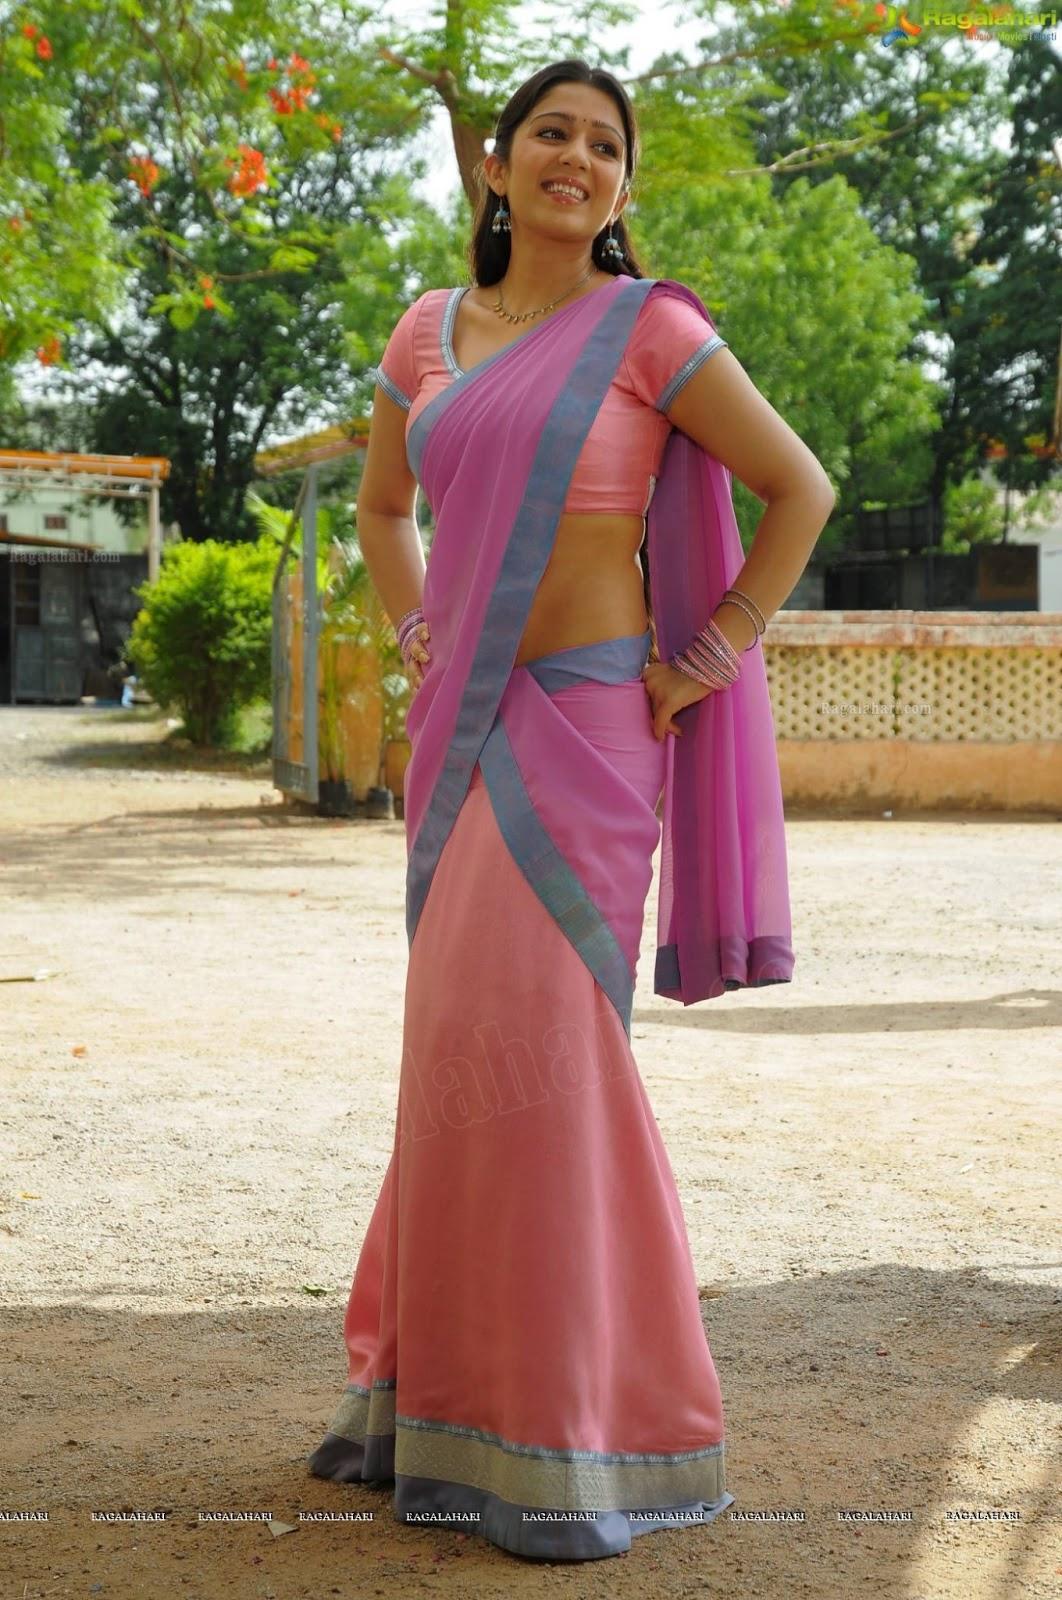 Charmi Kaur In Saree - Side Poses Hot Stills - Sabwoodcom-7063